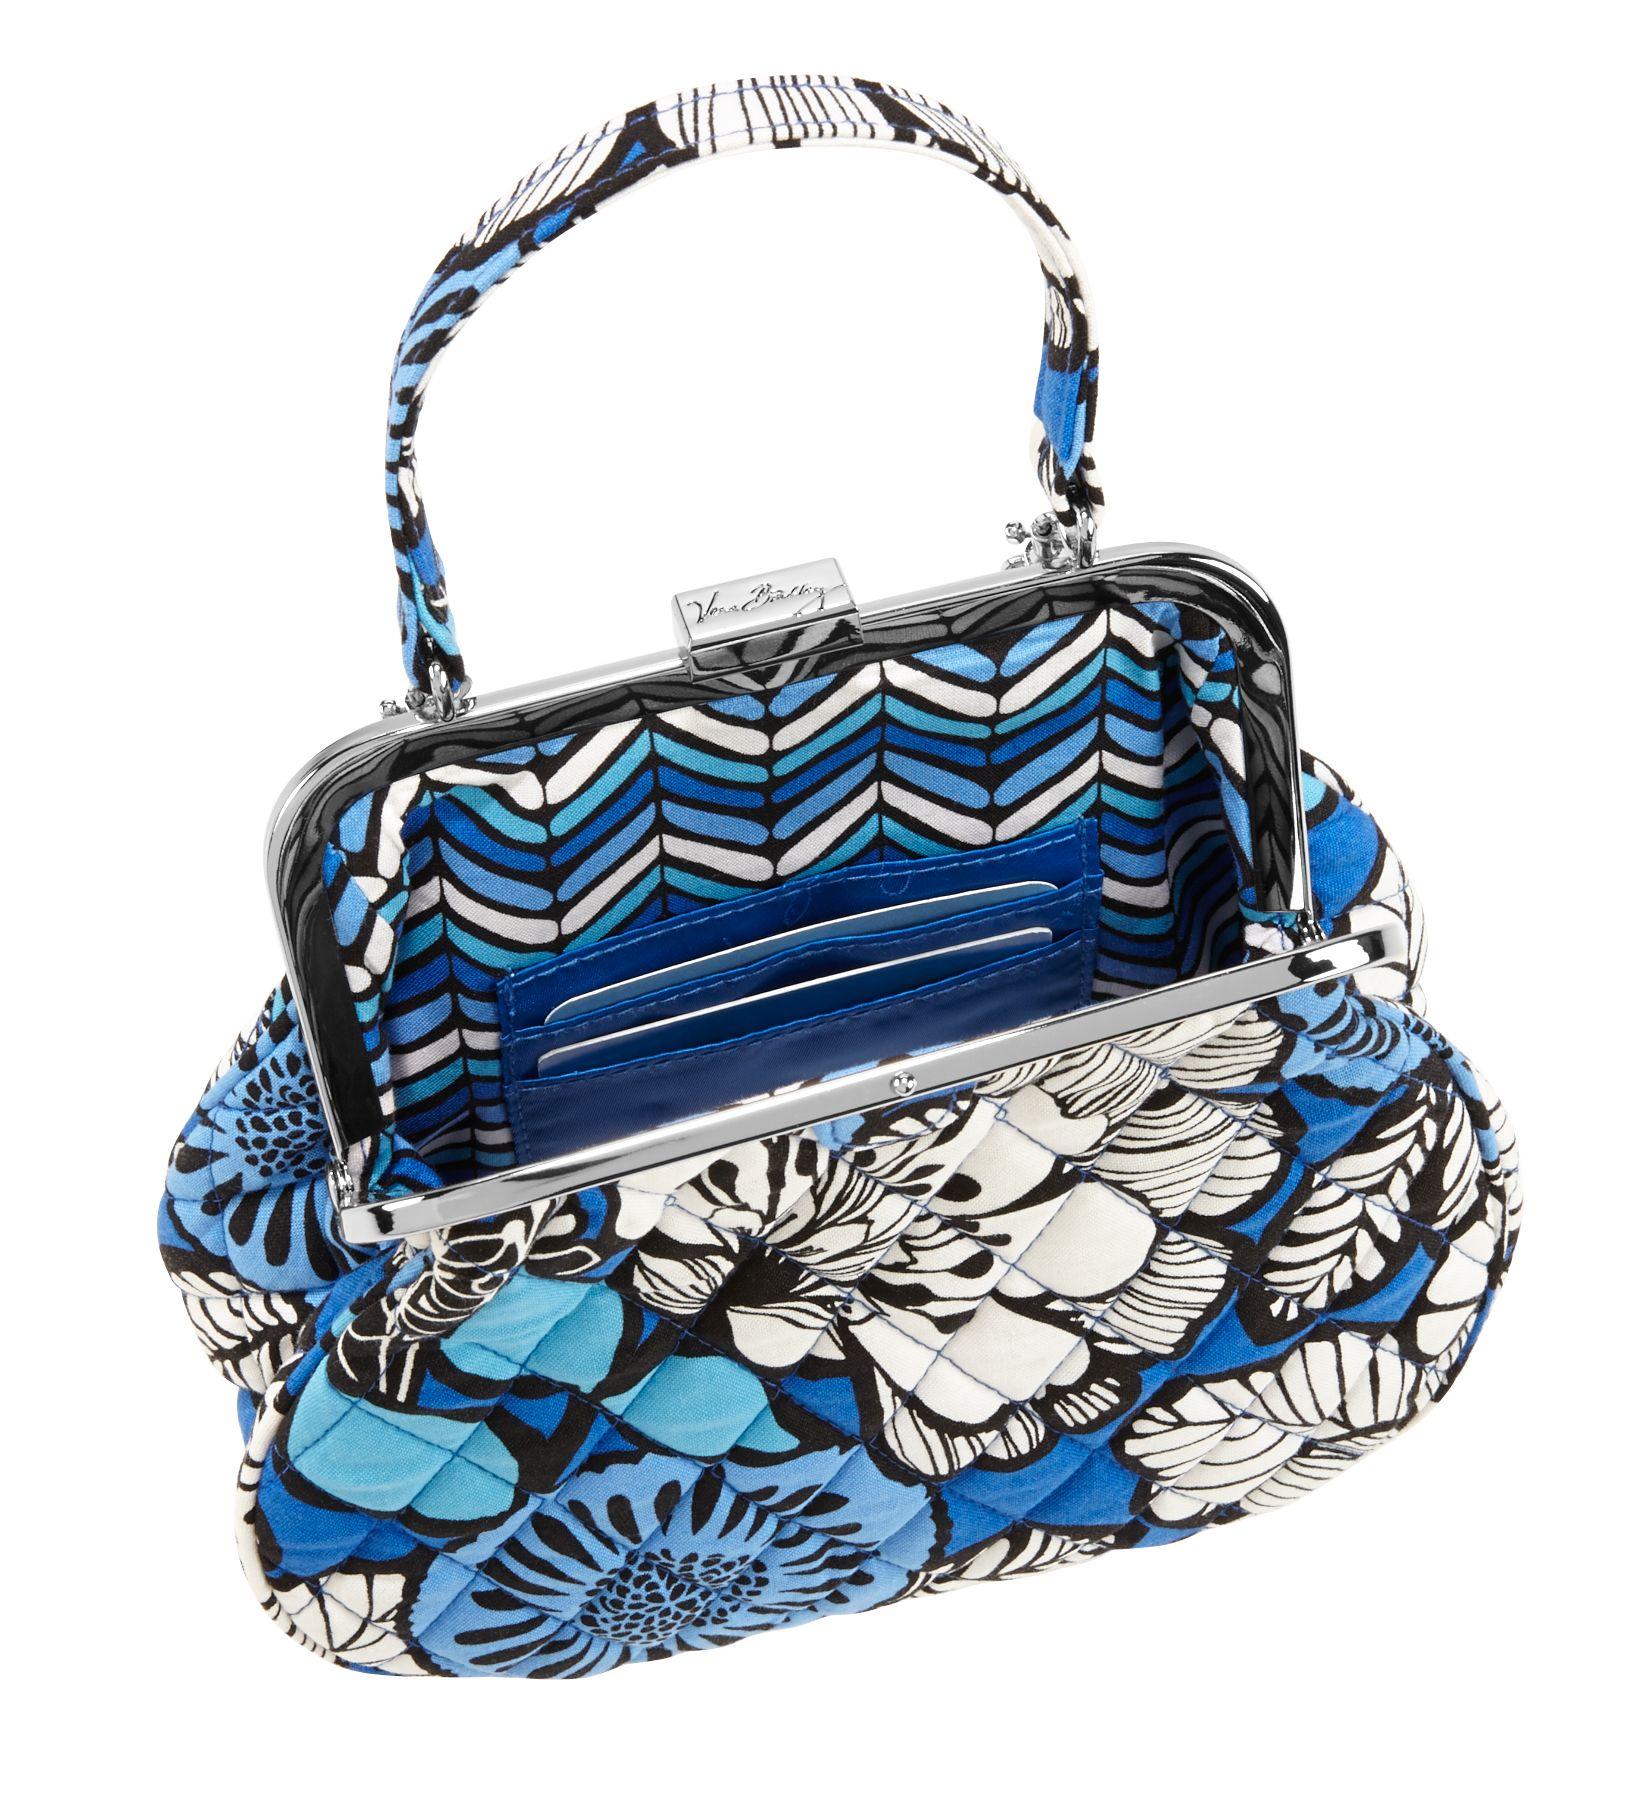 Bolsa cruzada de Marco de Vera Bradley Mini | eBay